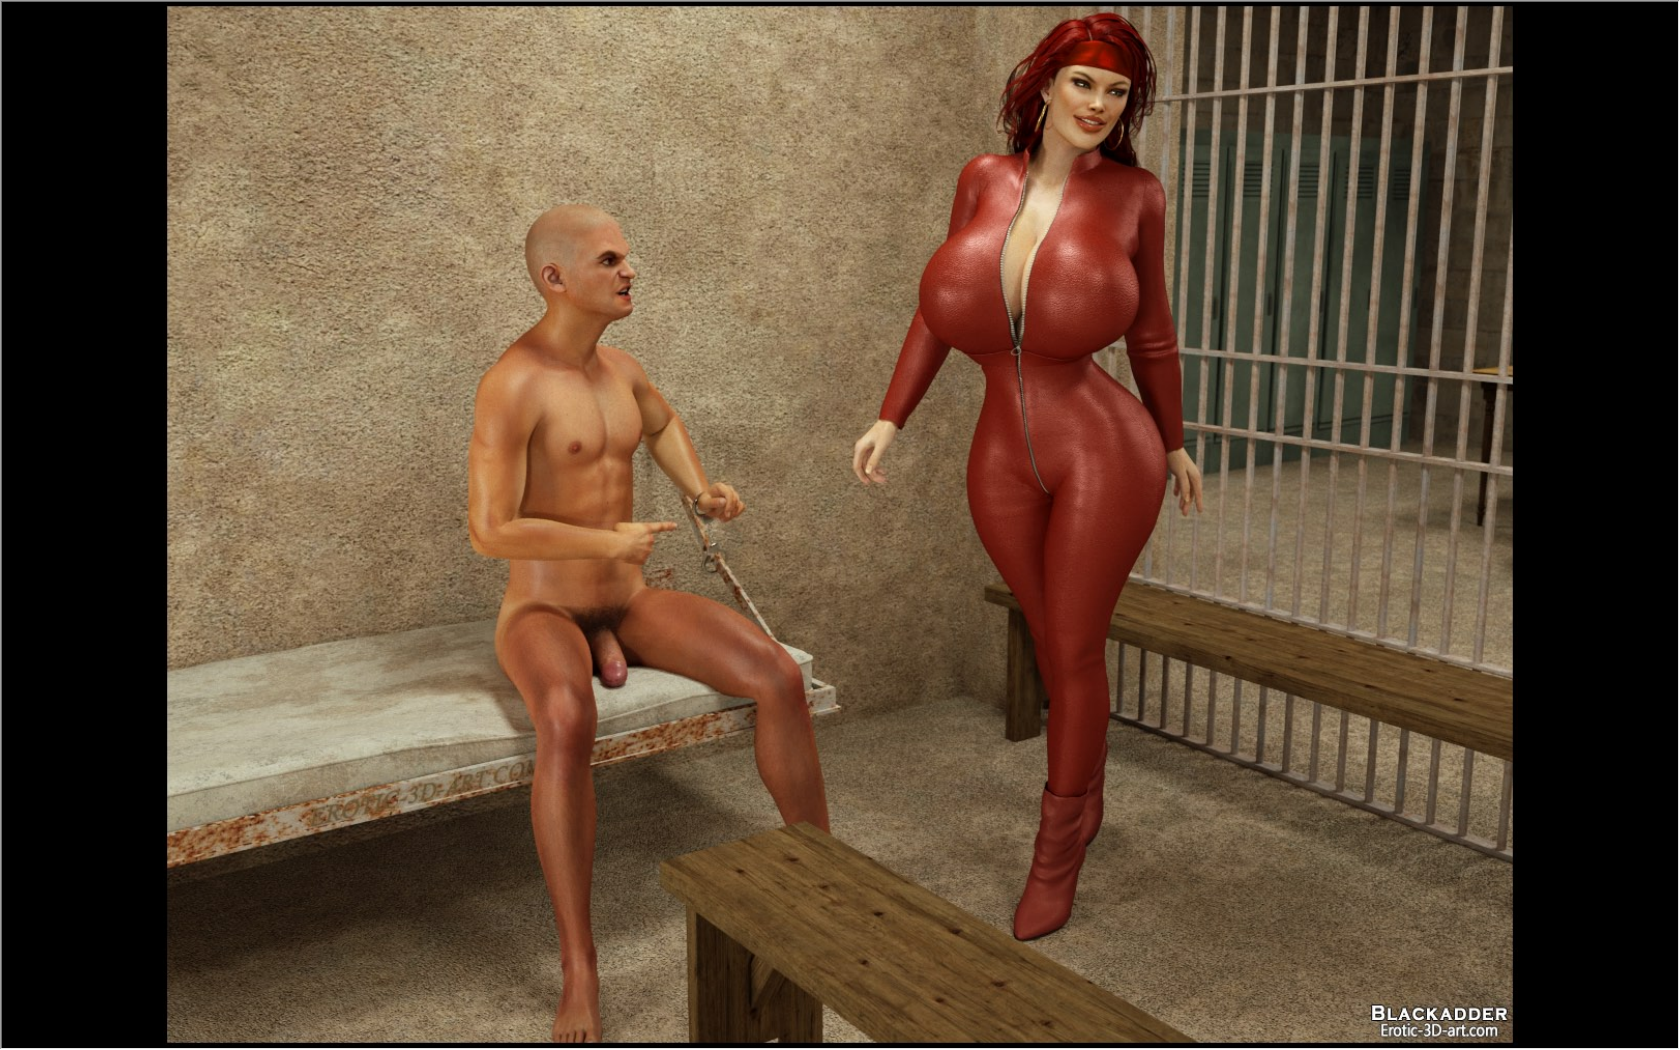 seks-pro-tyurme-minet-snyatiy-na-mobilu-smotret